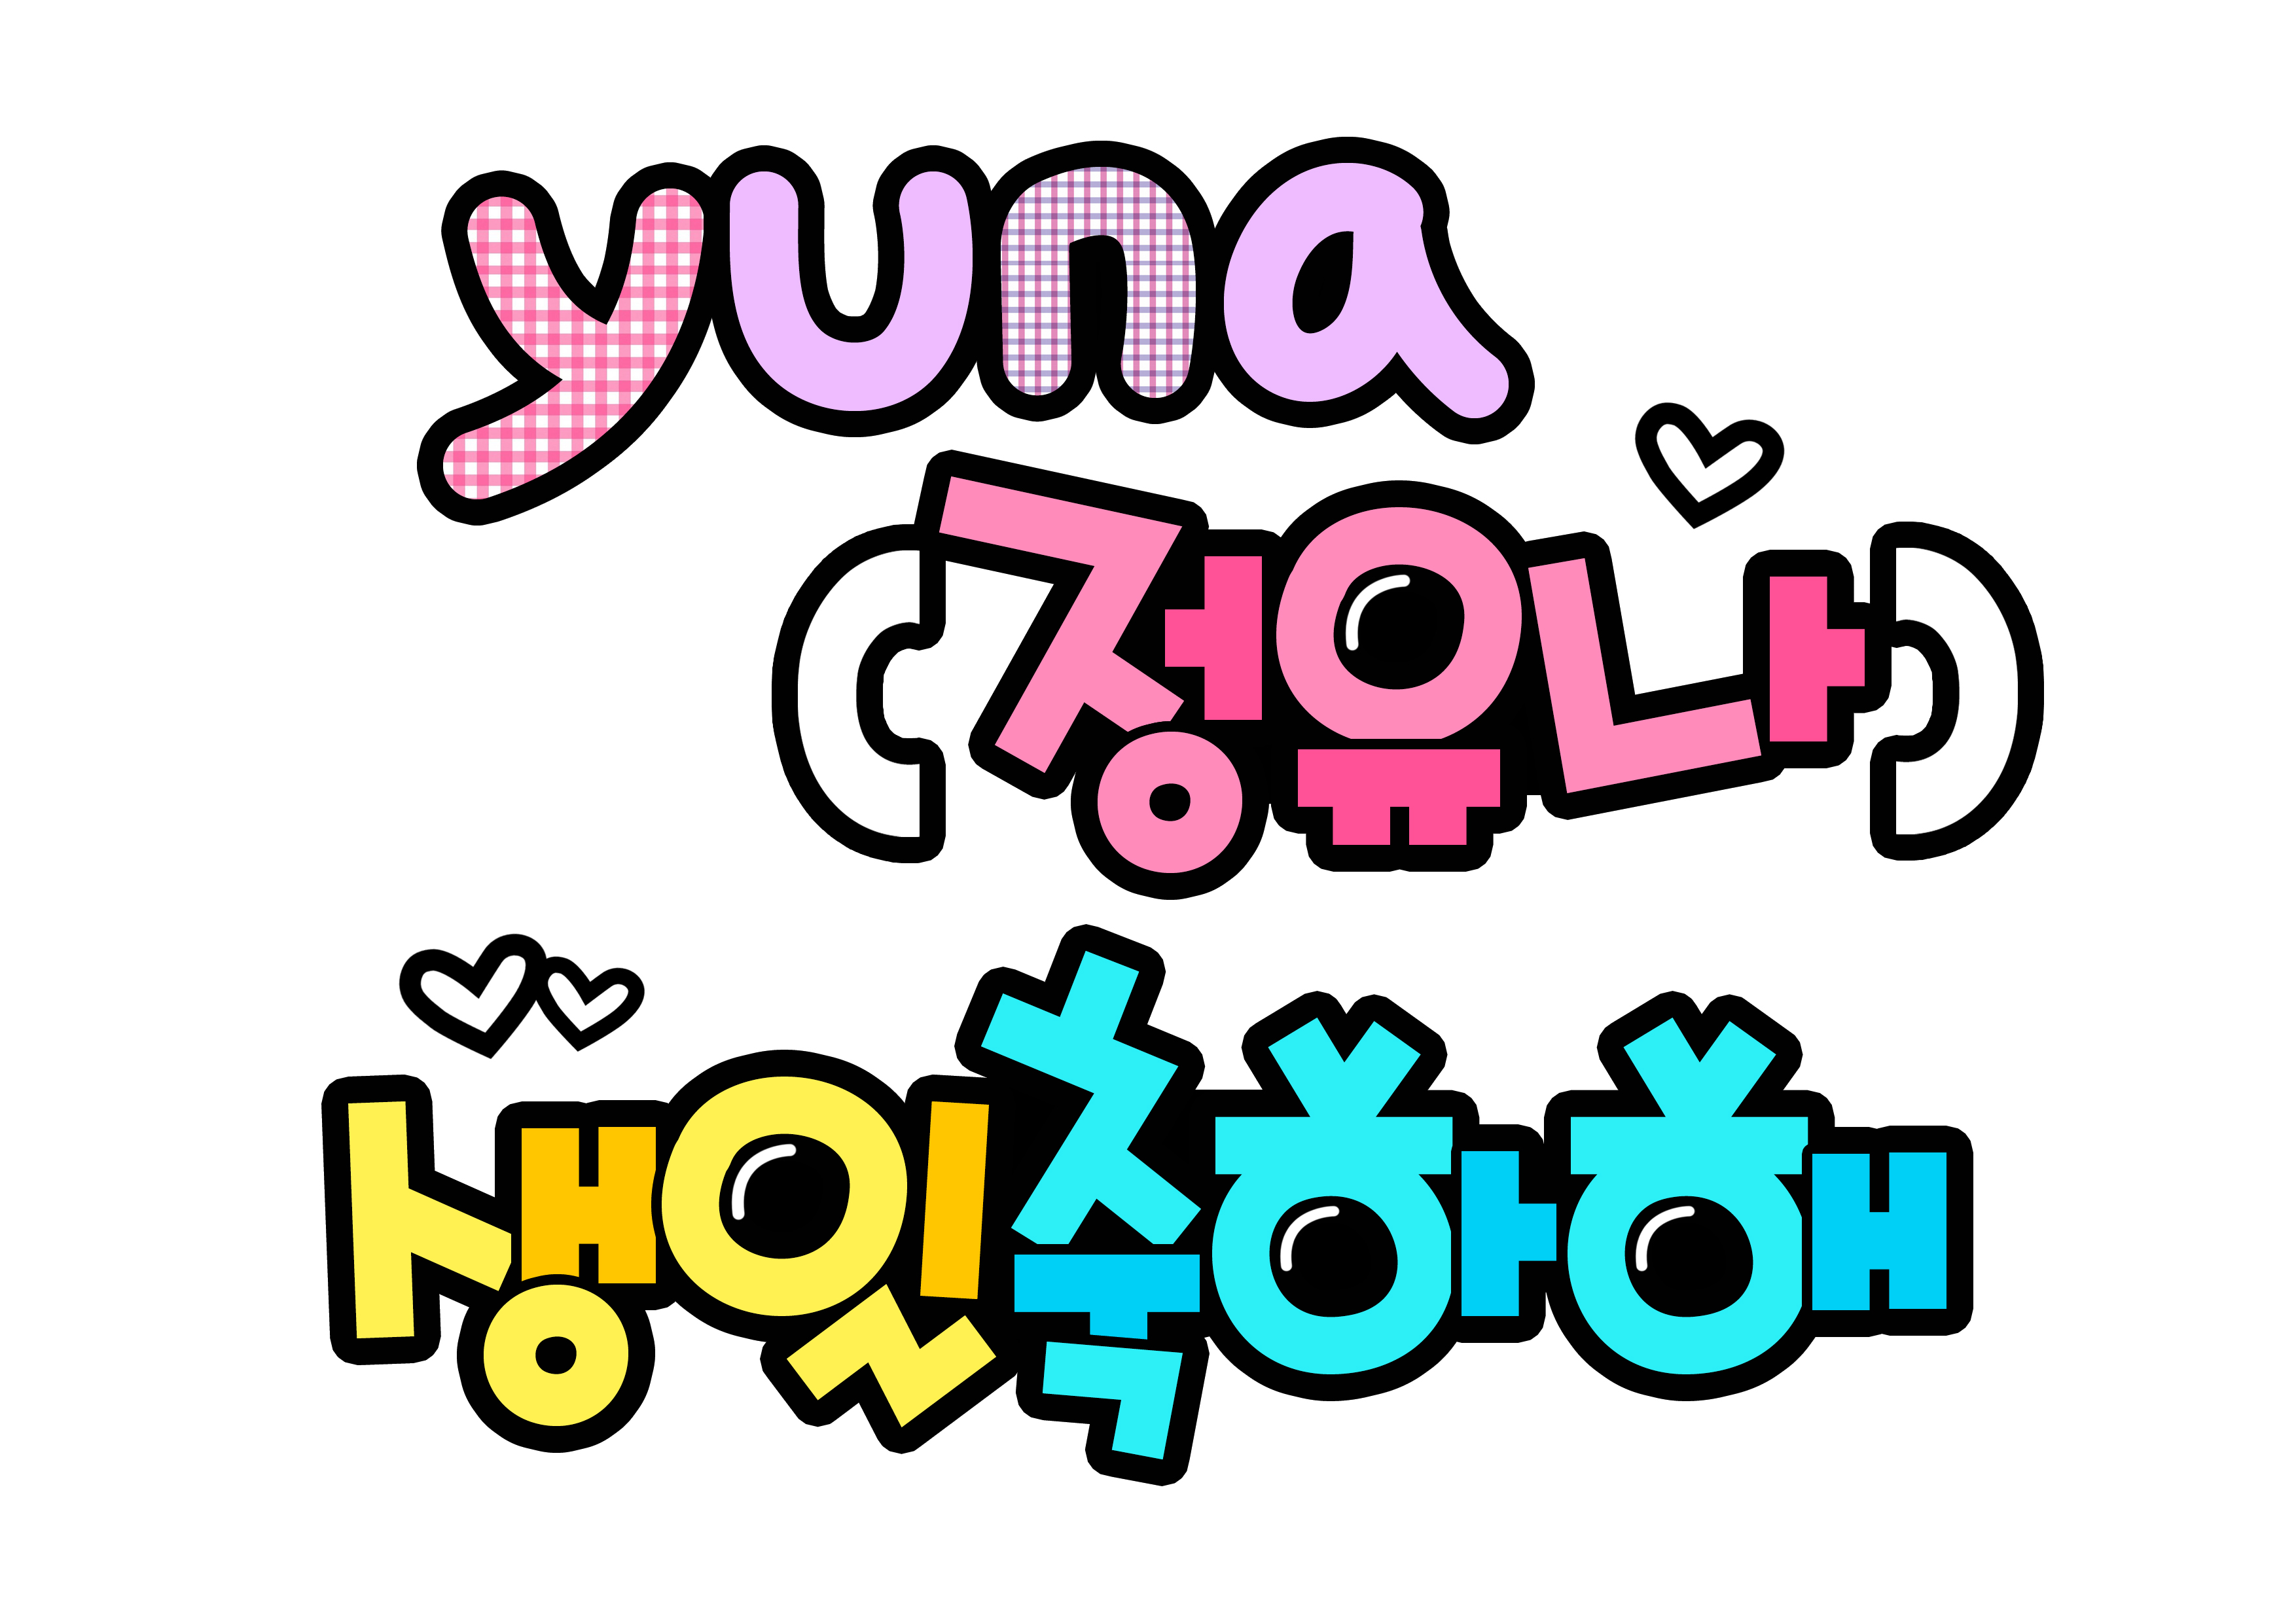 yuna(정유나) 생일축하해